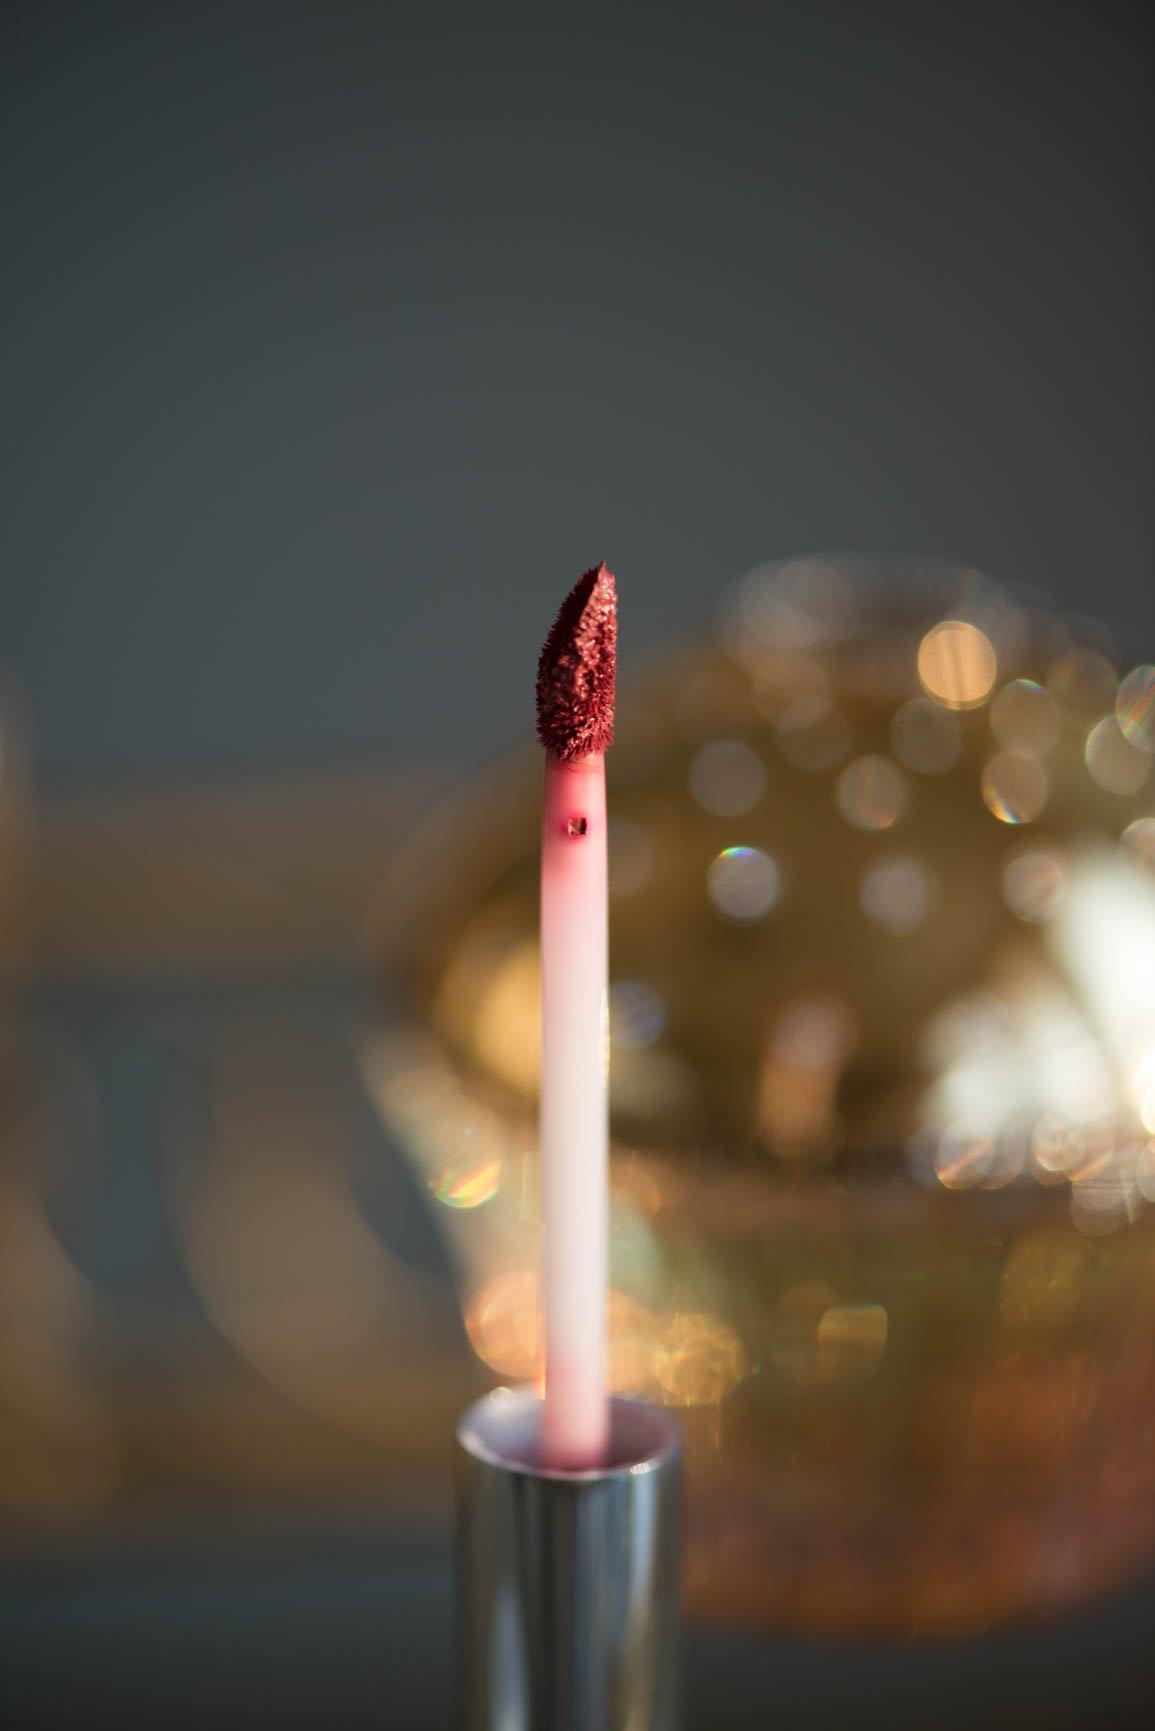 Anastasia Beverly Hills Liquid Lipstick applicator